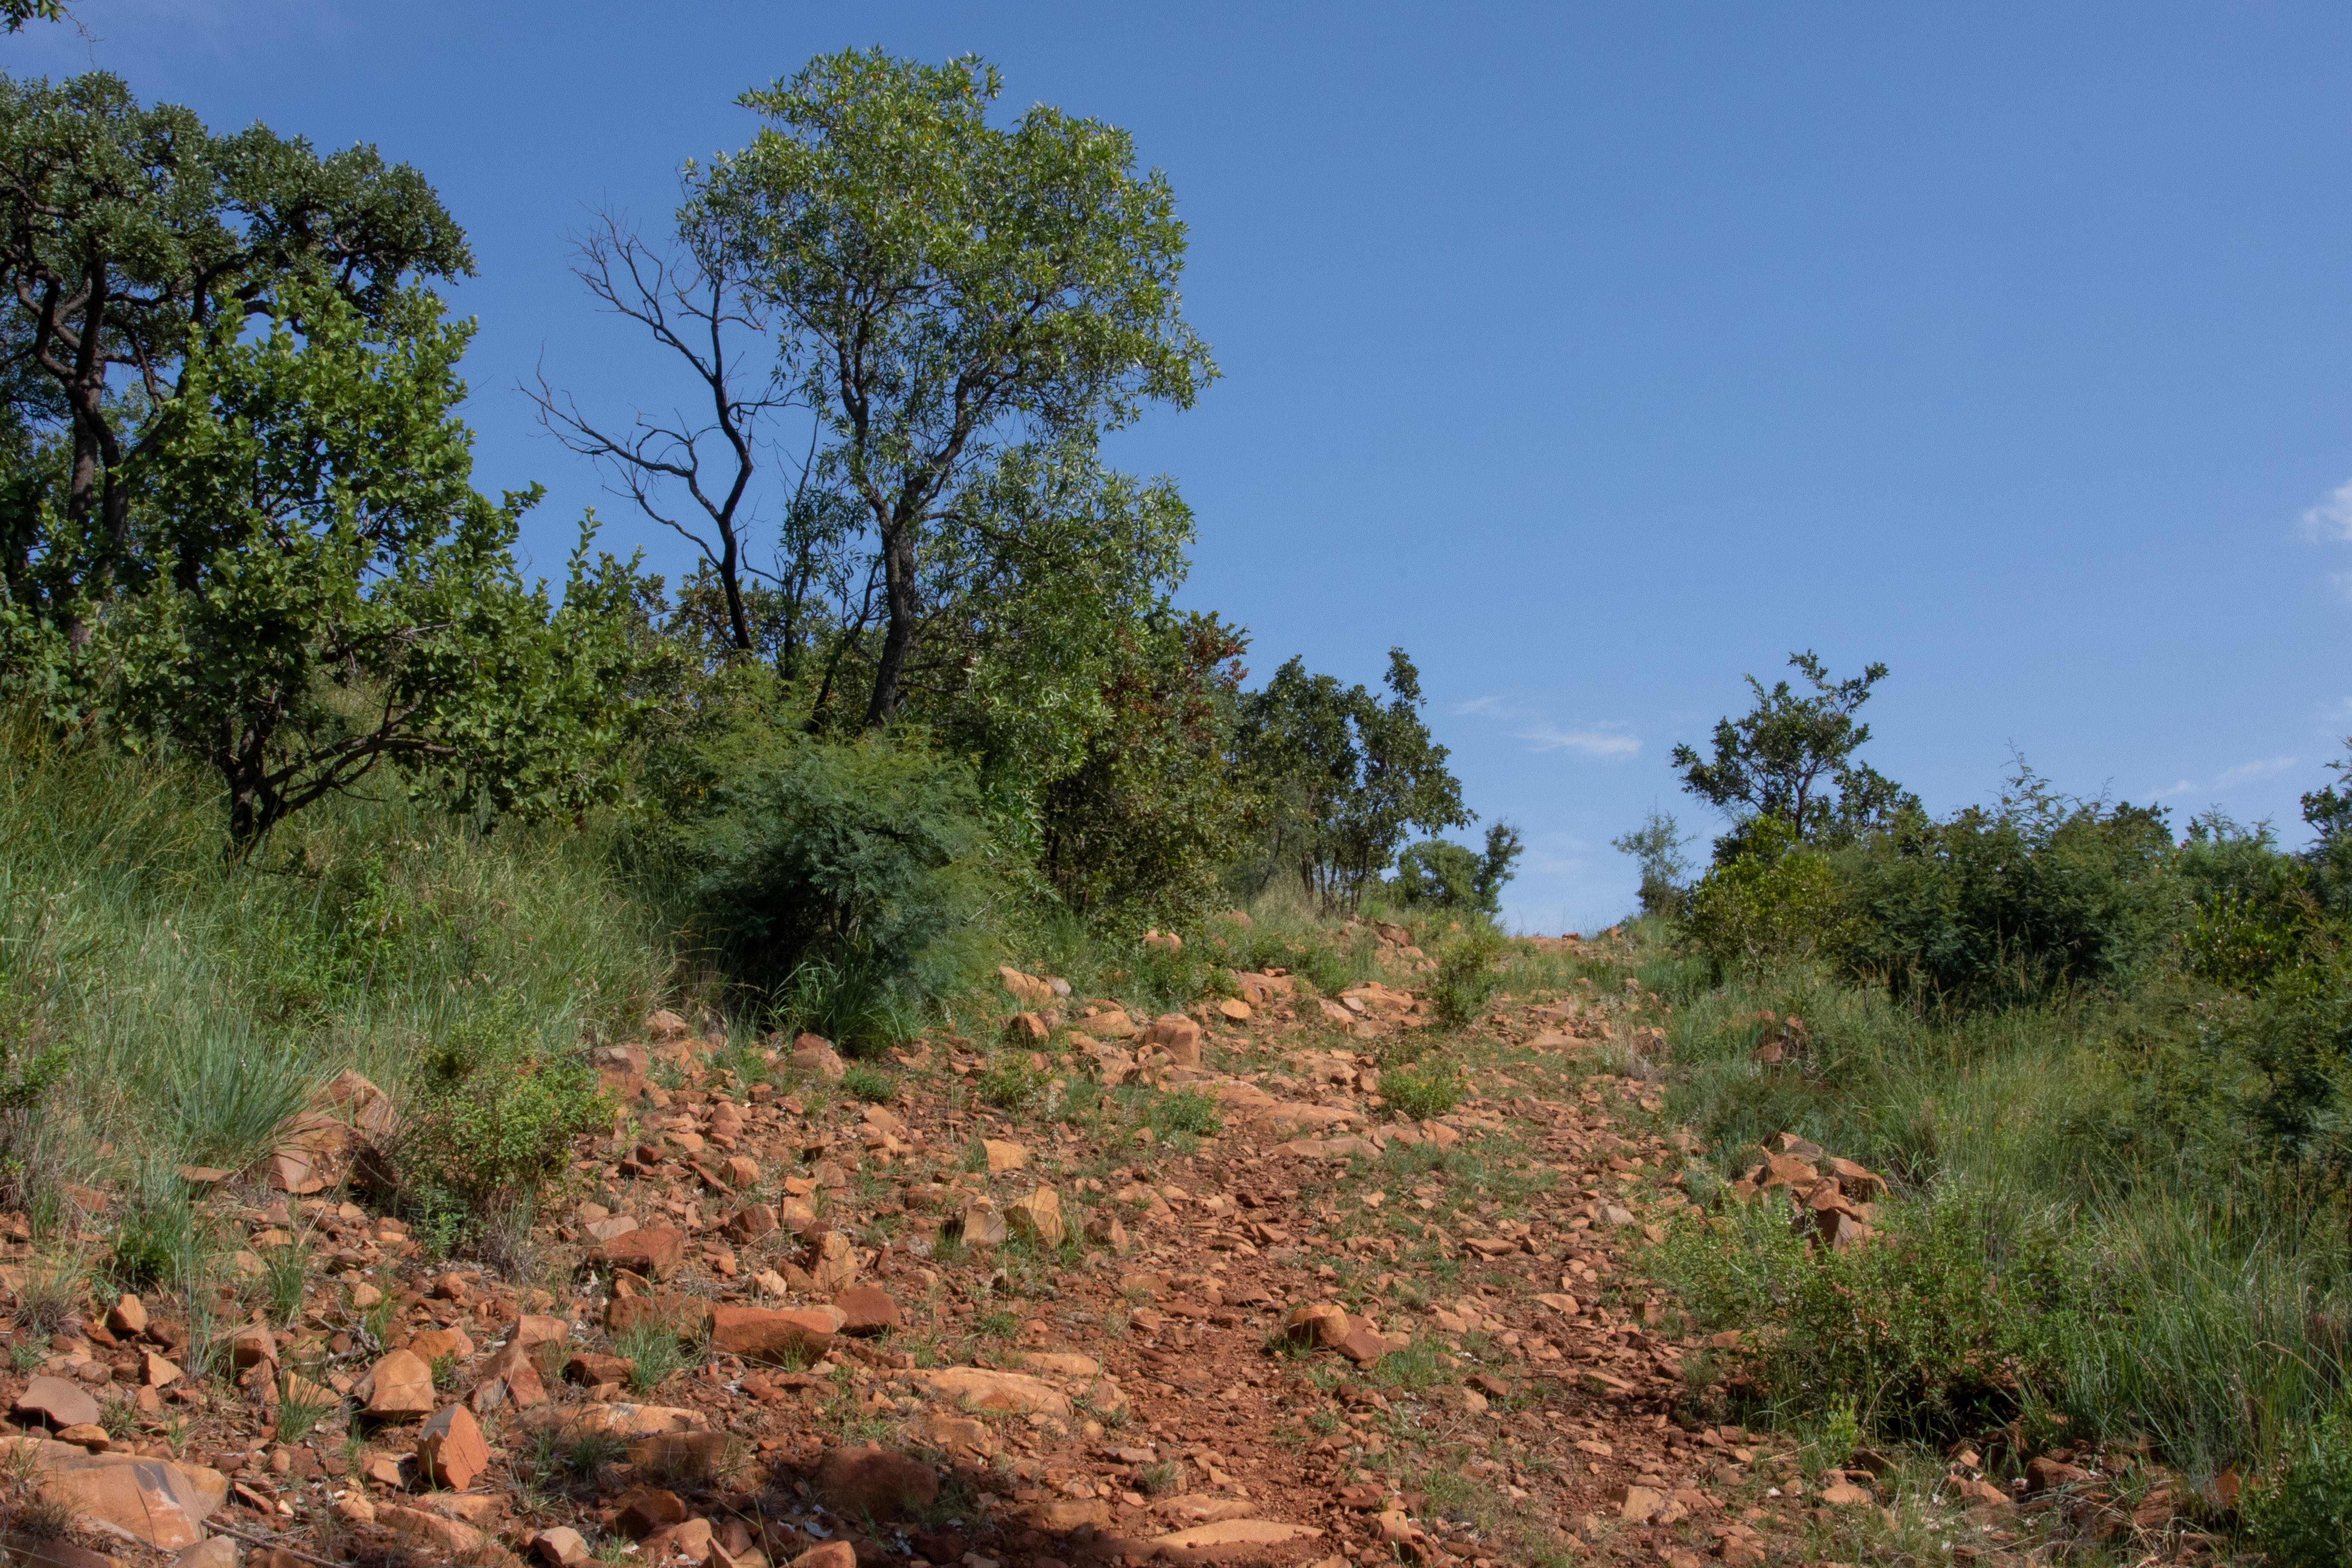 of adventure, beauty in nature, blue sky, bushveld